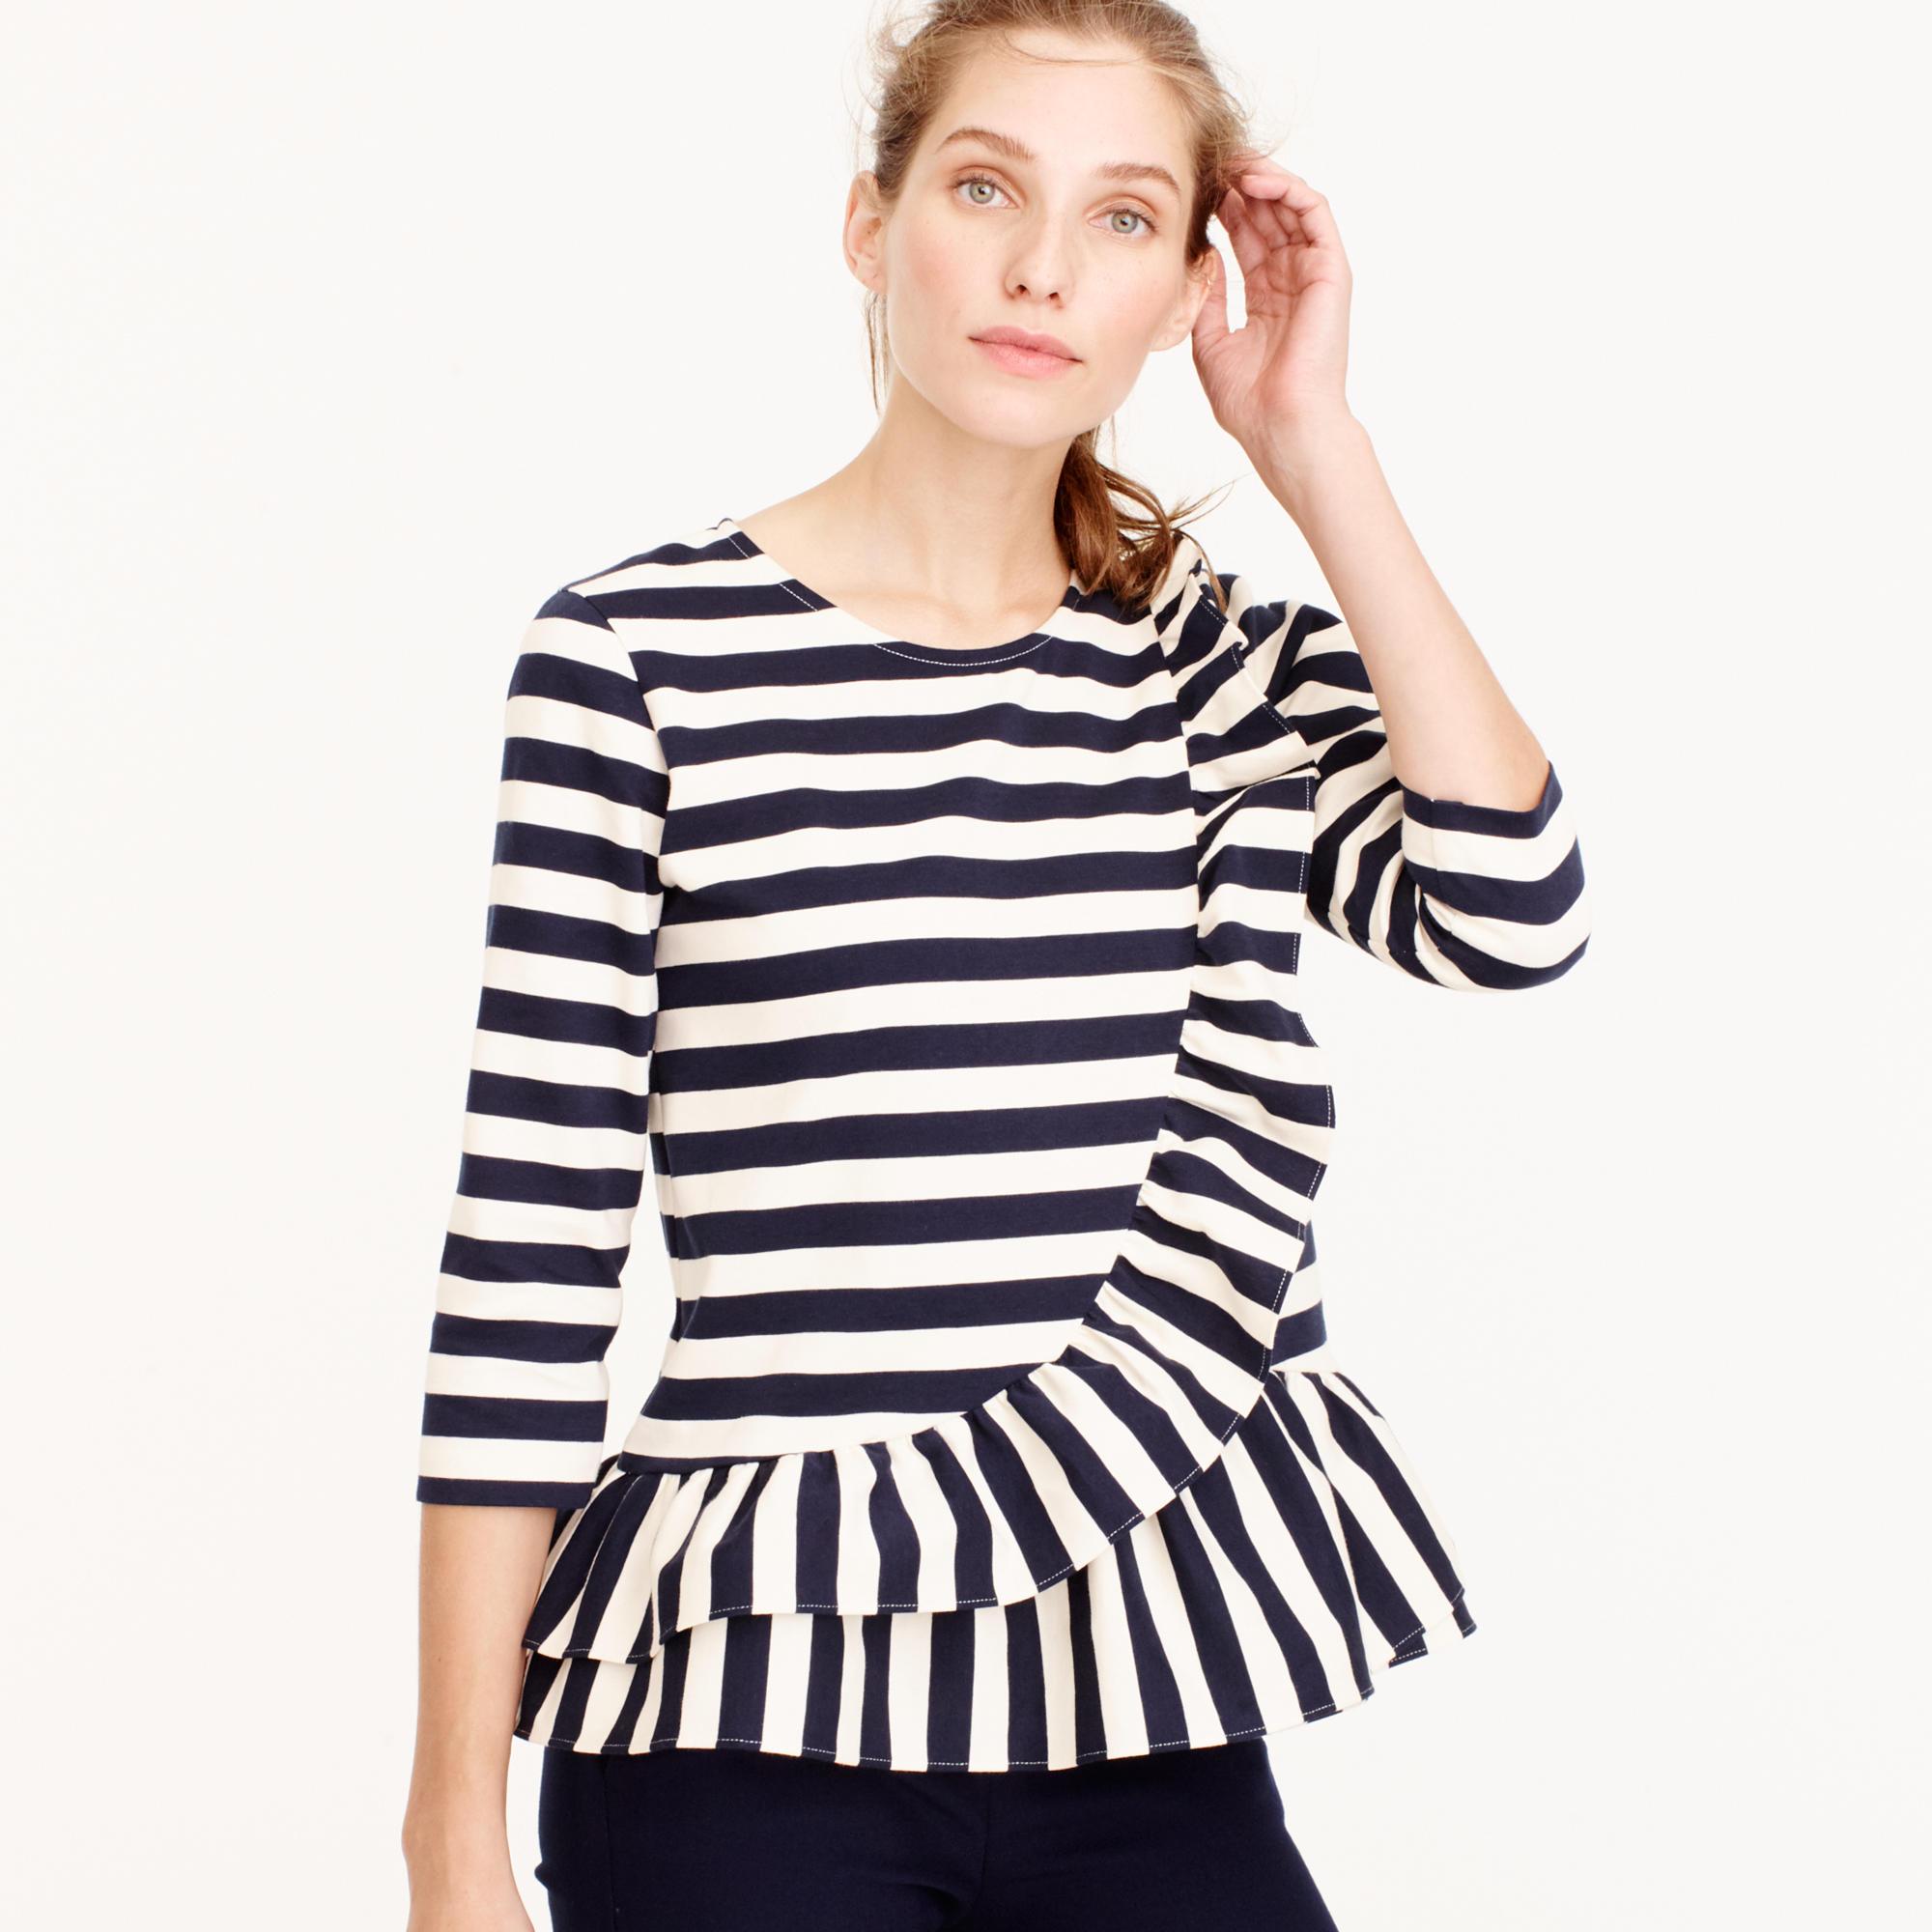 jcrew striped shirt.jpeg